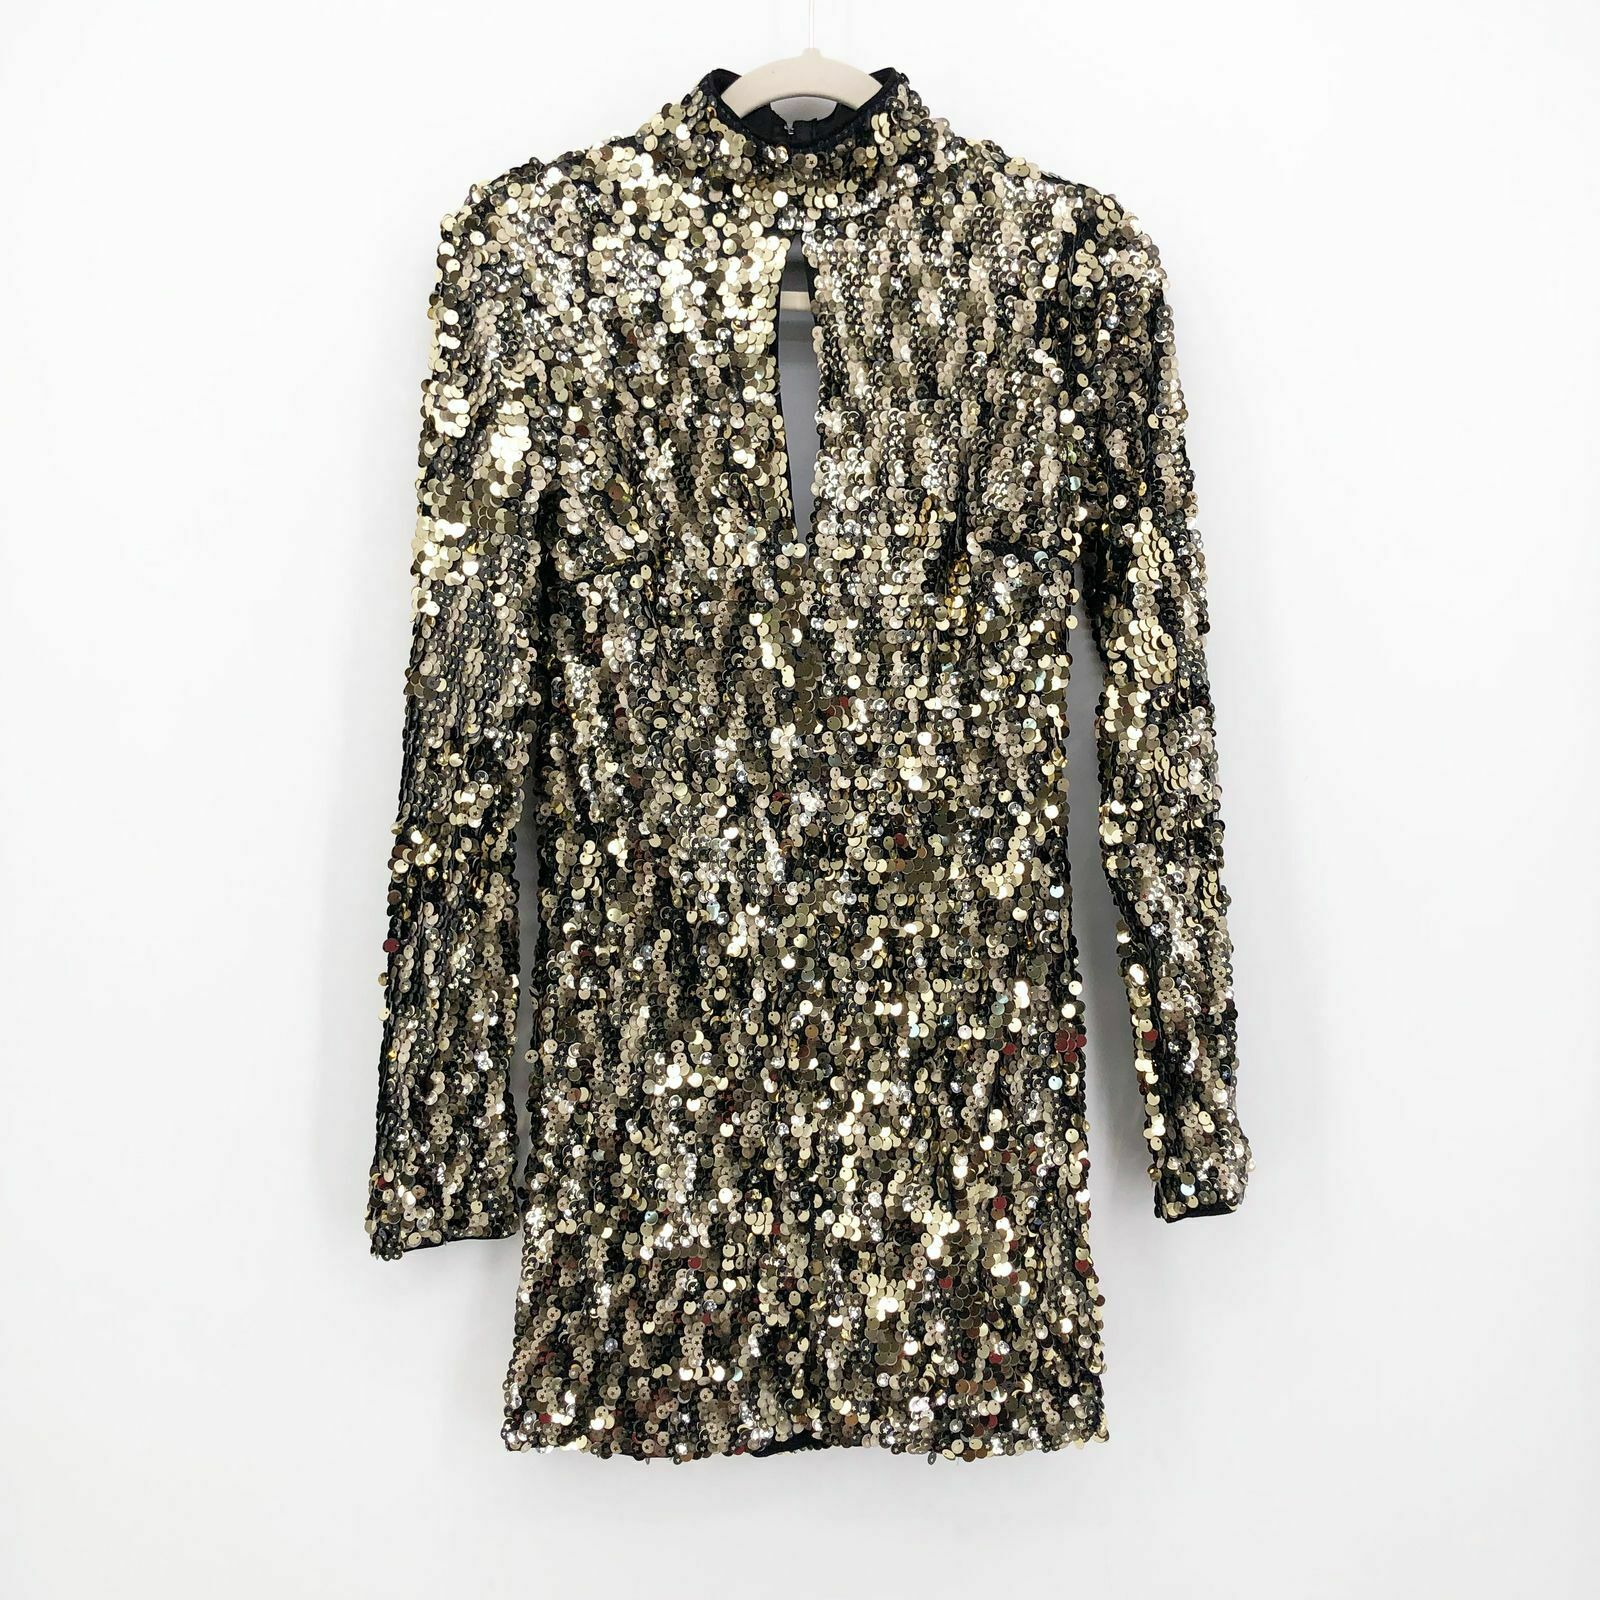 michael costello revolve women's dress seneca mini gold star sequin size m  $238